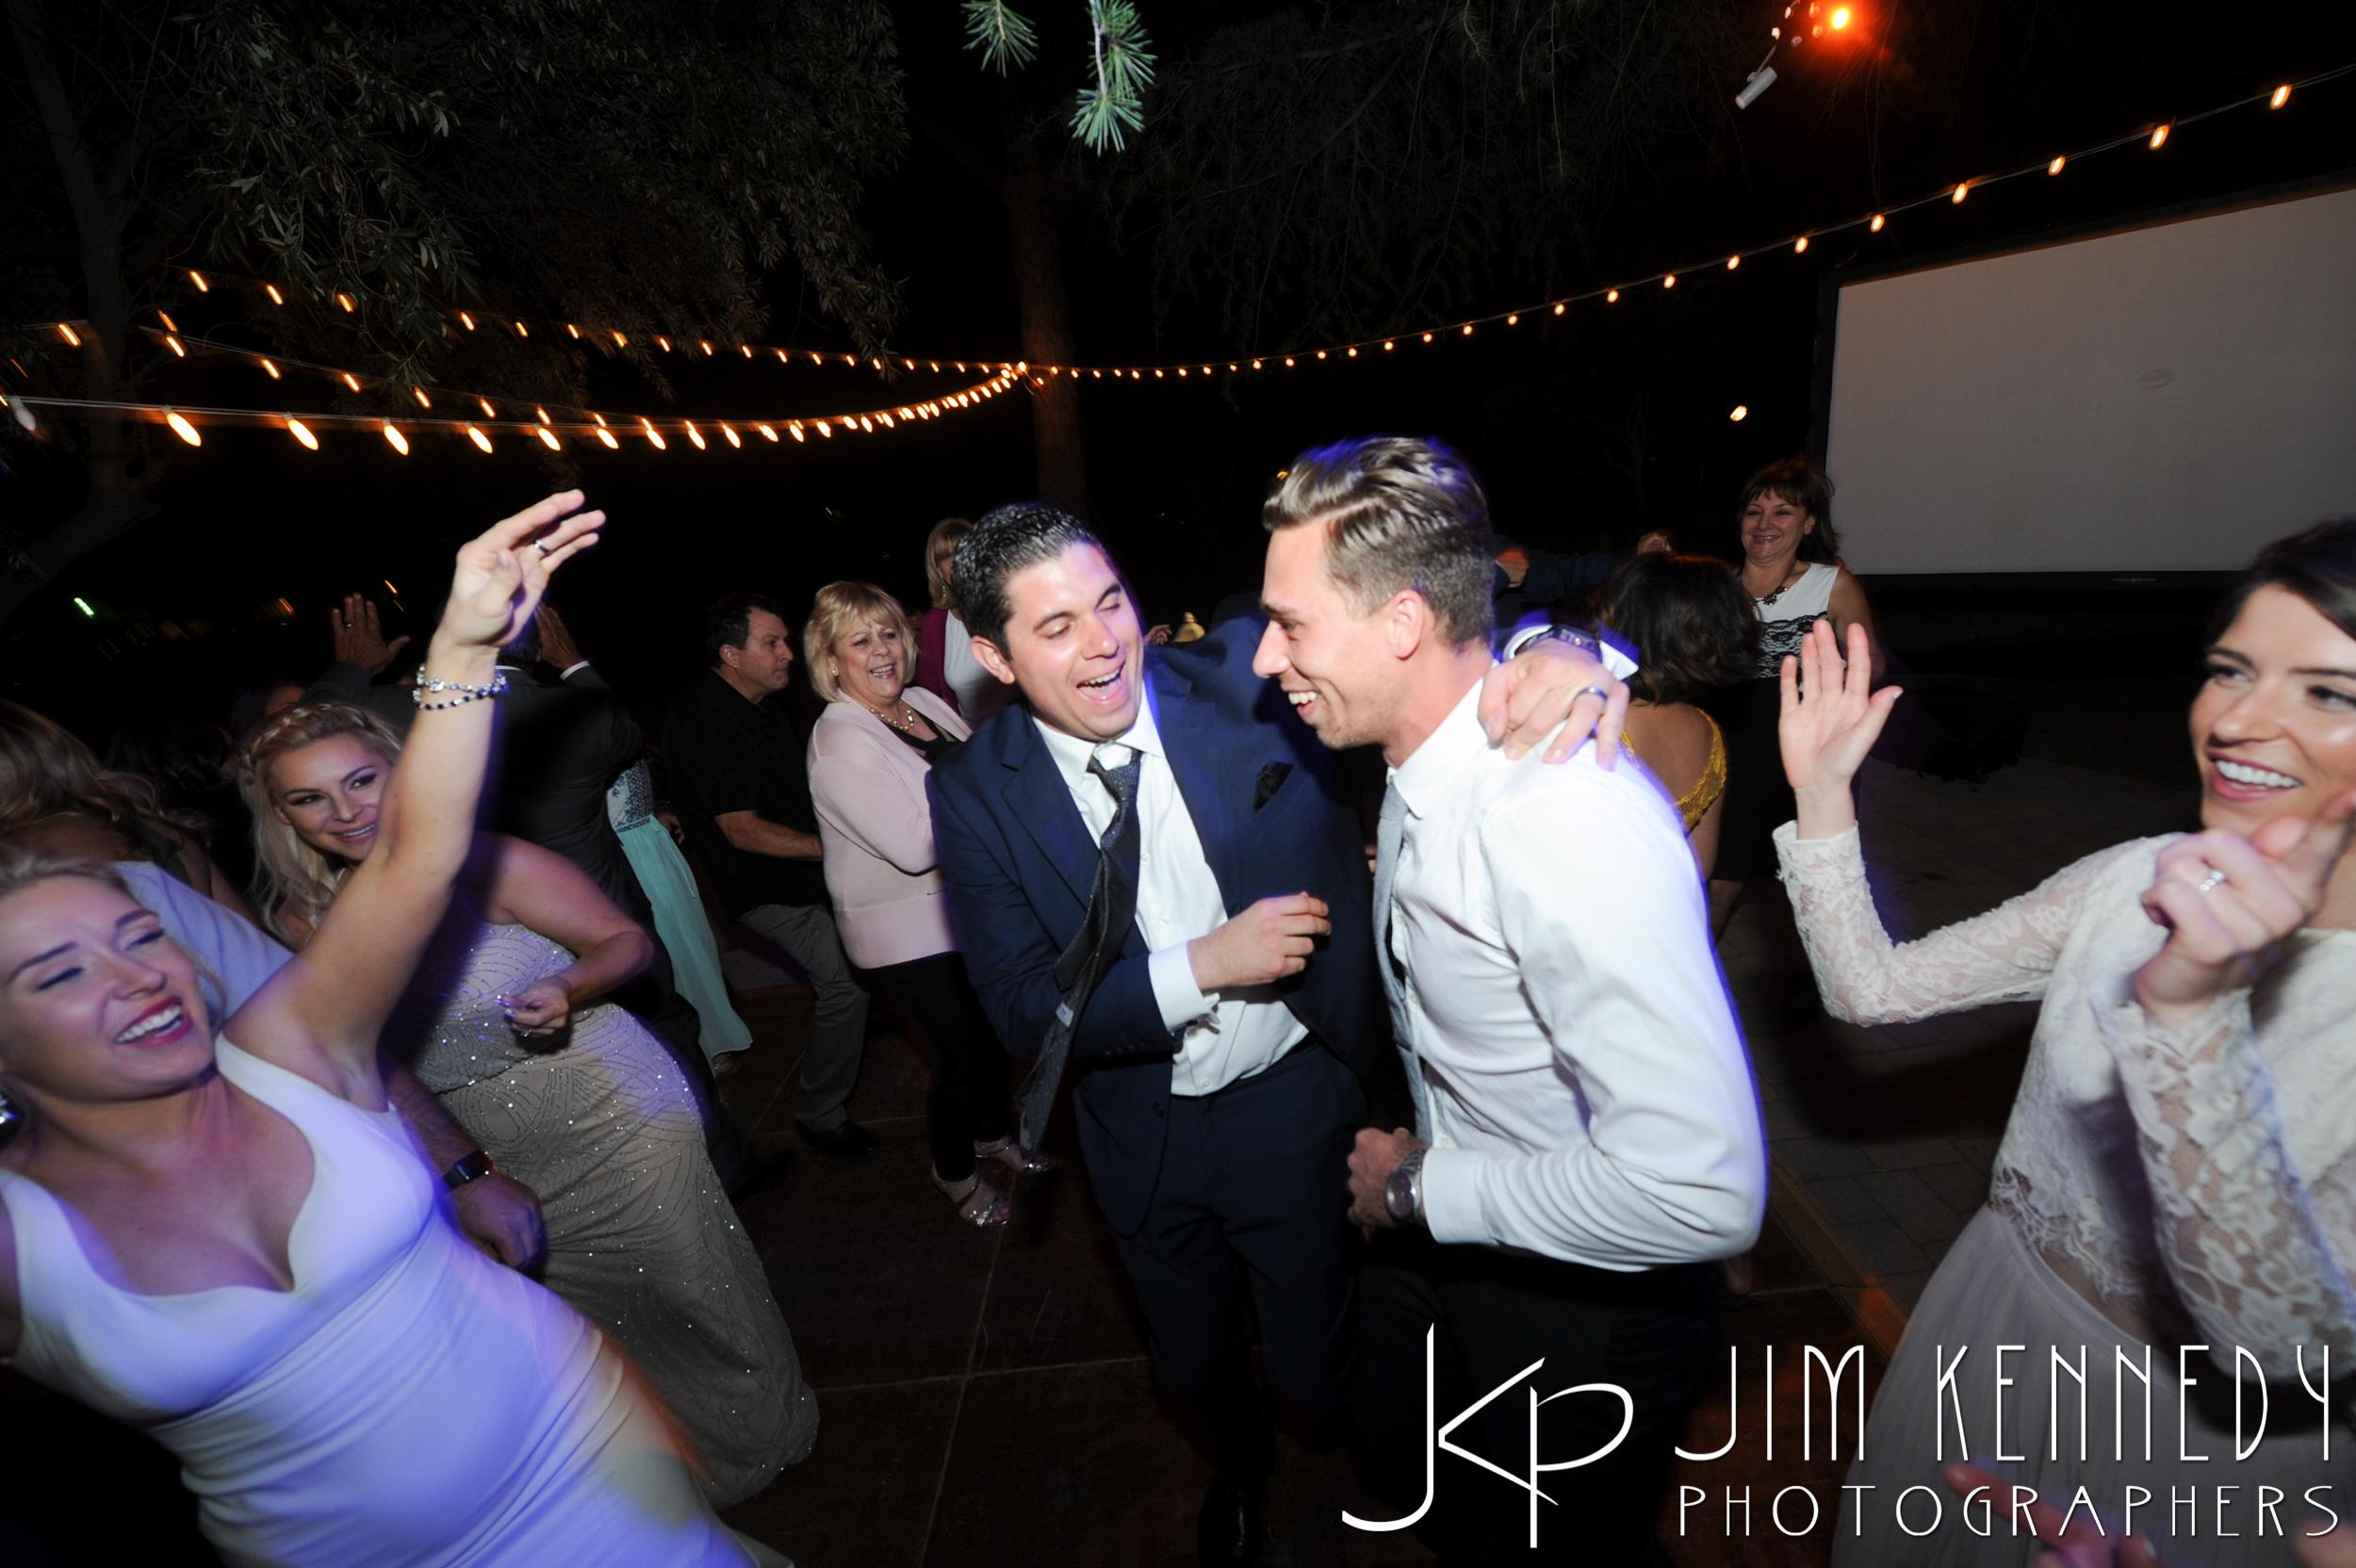 jim_kennedy_photographers_highland_springs_wedding_caitlyn_0216.jpg